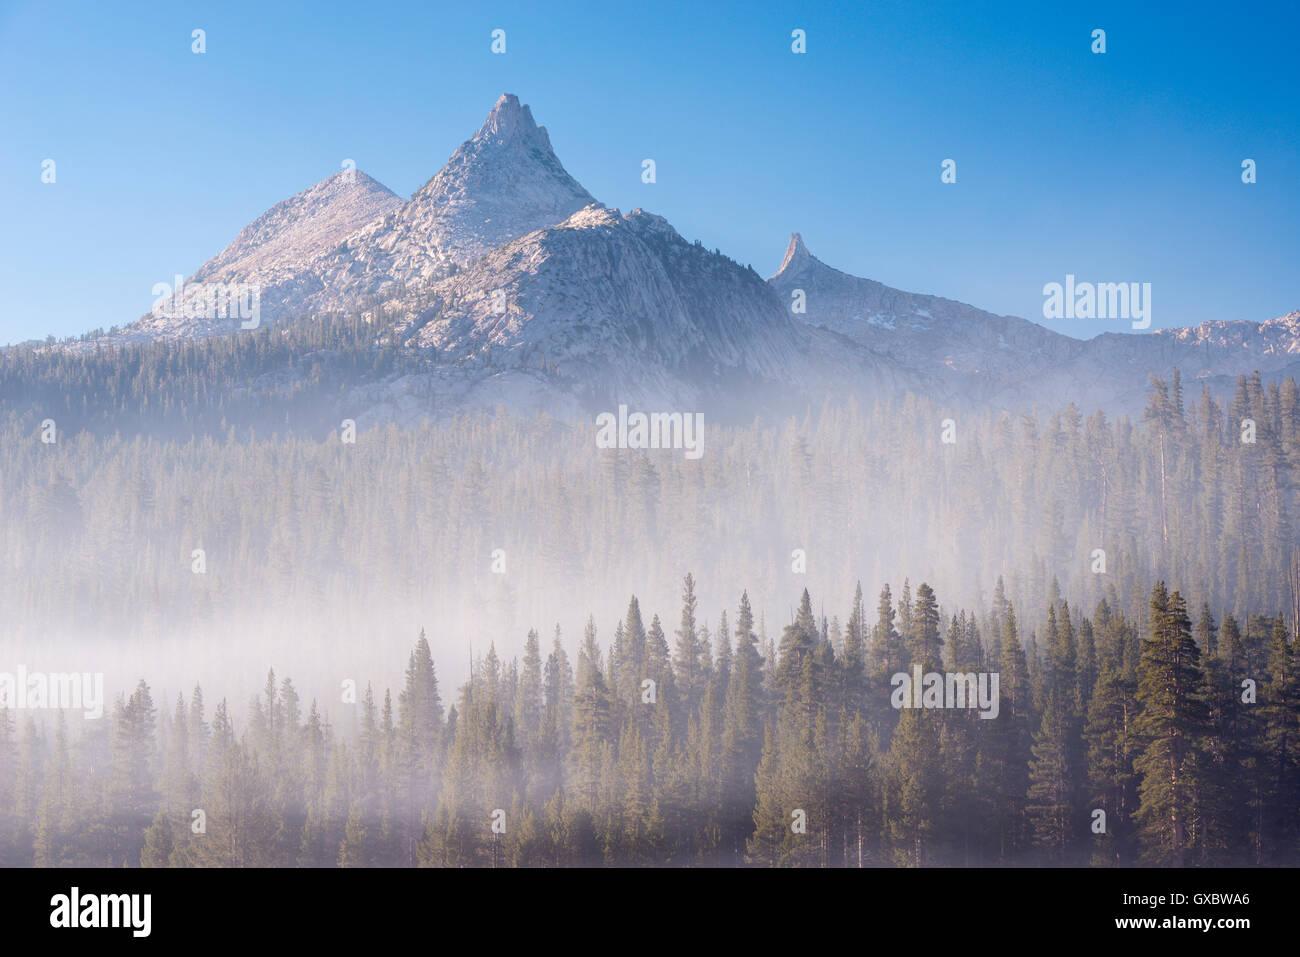 Unicorn Peak rising above a mist shrouded forest, Yosemite National Park, California, USA. Autumn (October) 2014. - Stock Image